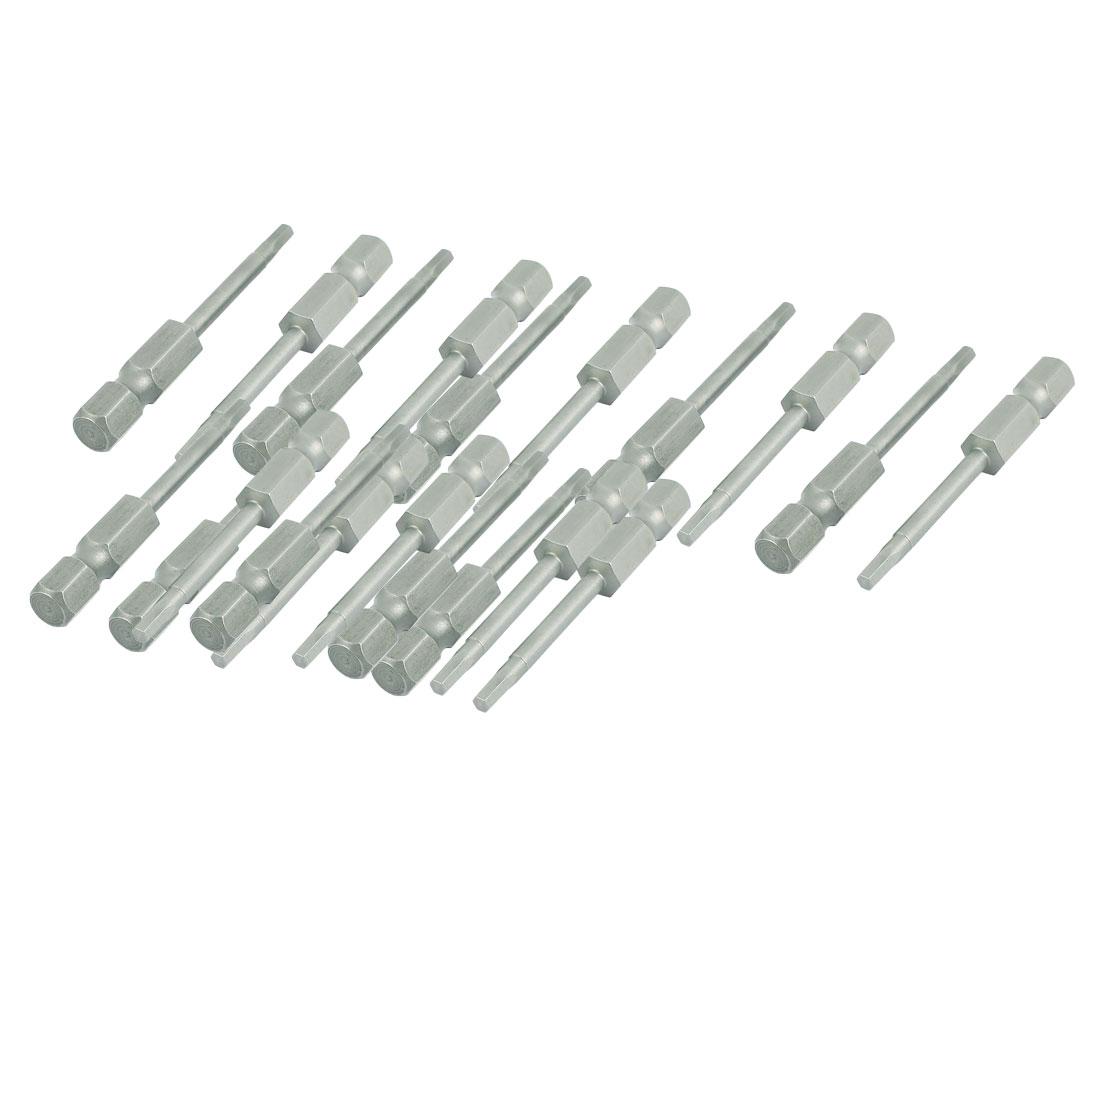 "50mm Long 1/4"" Hex Shank H2.5 Hexagon Magnetic Insert Screwdriver Bits 20pcs"